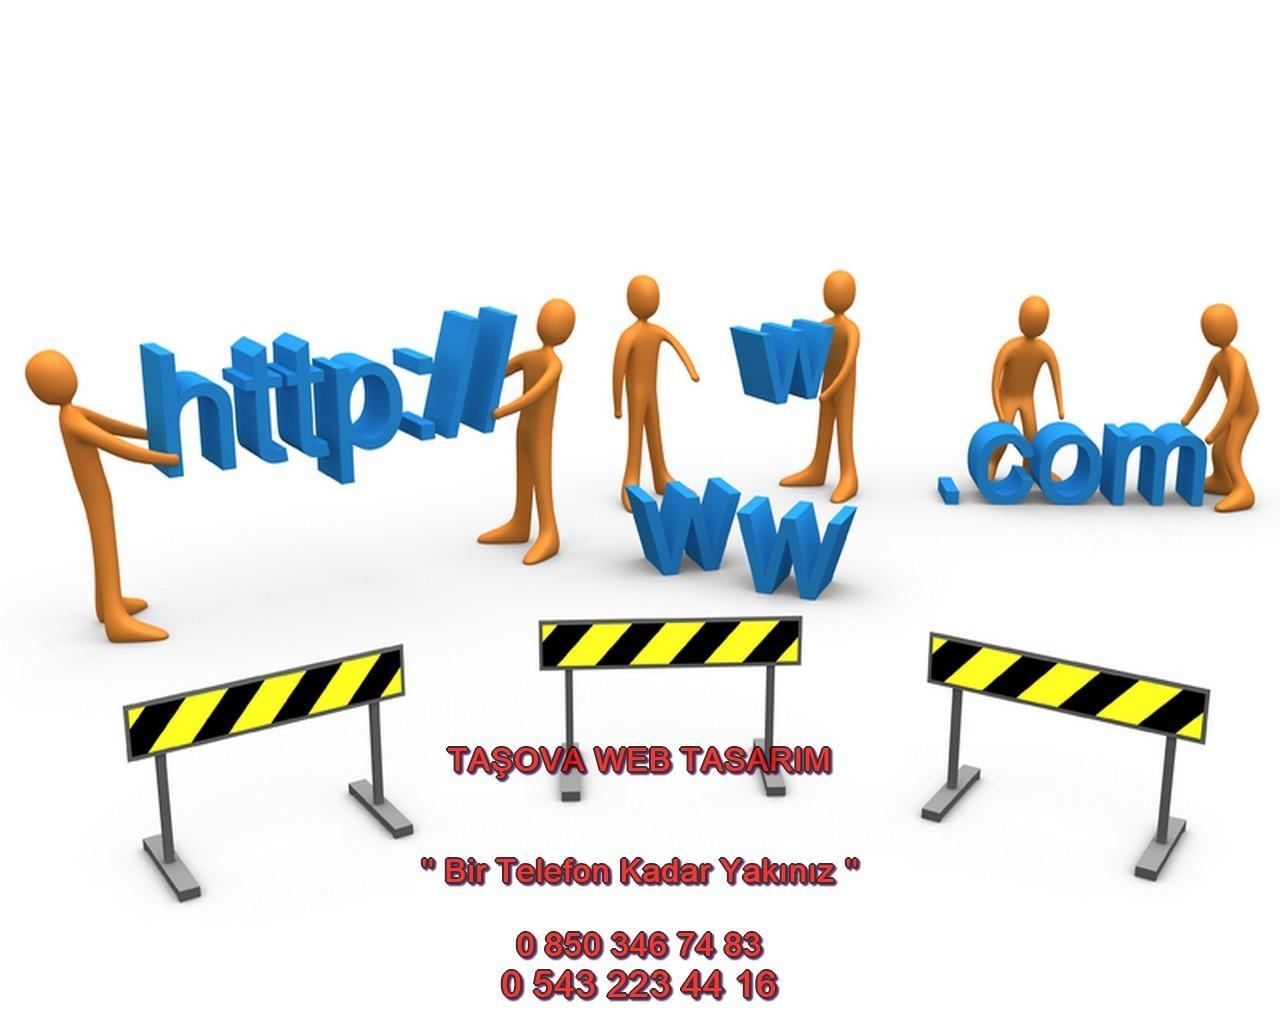 Taşova Web Tasarım